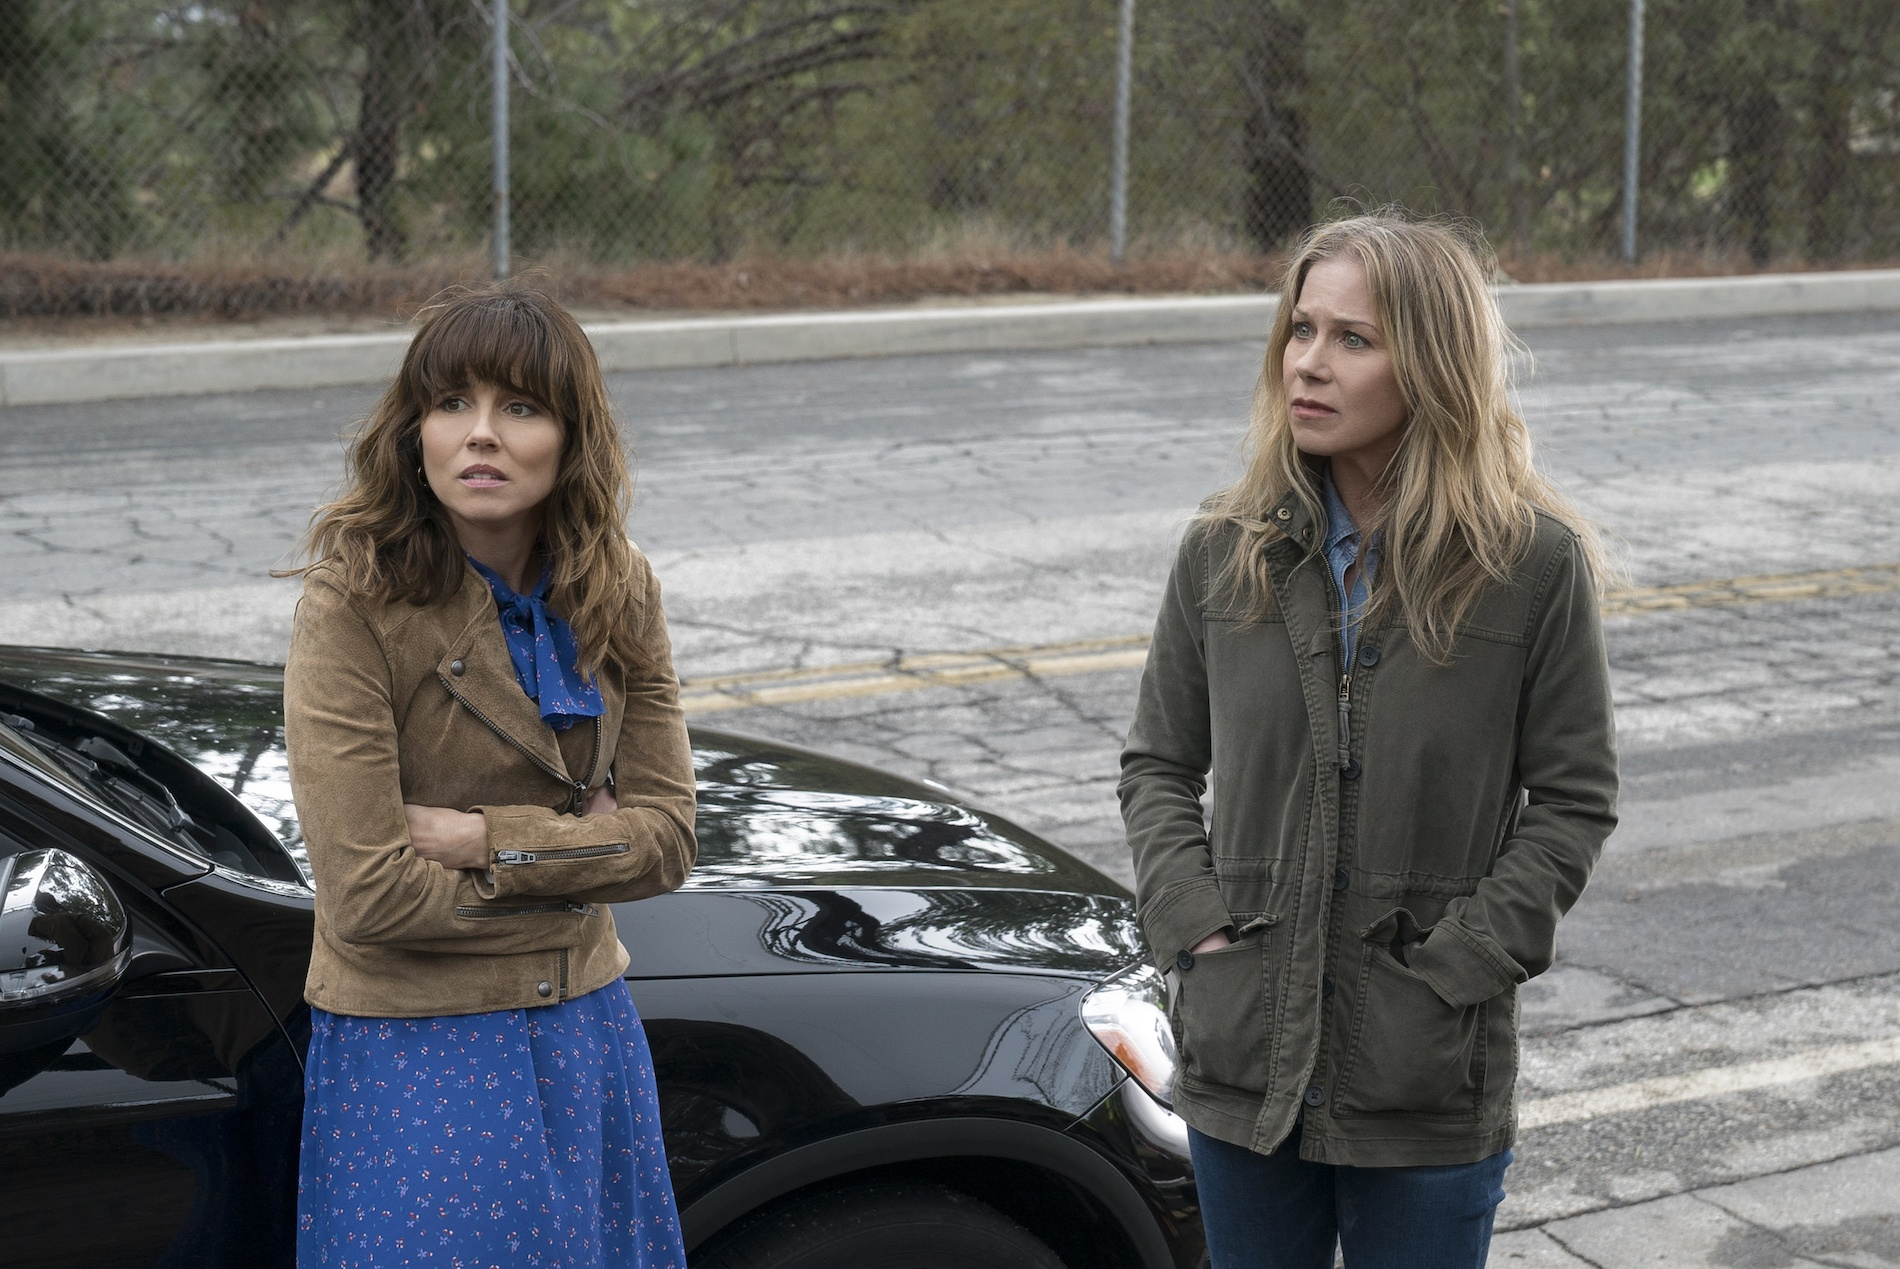 'Dead to Me' Creator Liz Feldman on Finding Inspiration in the Grim